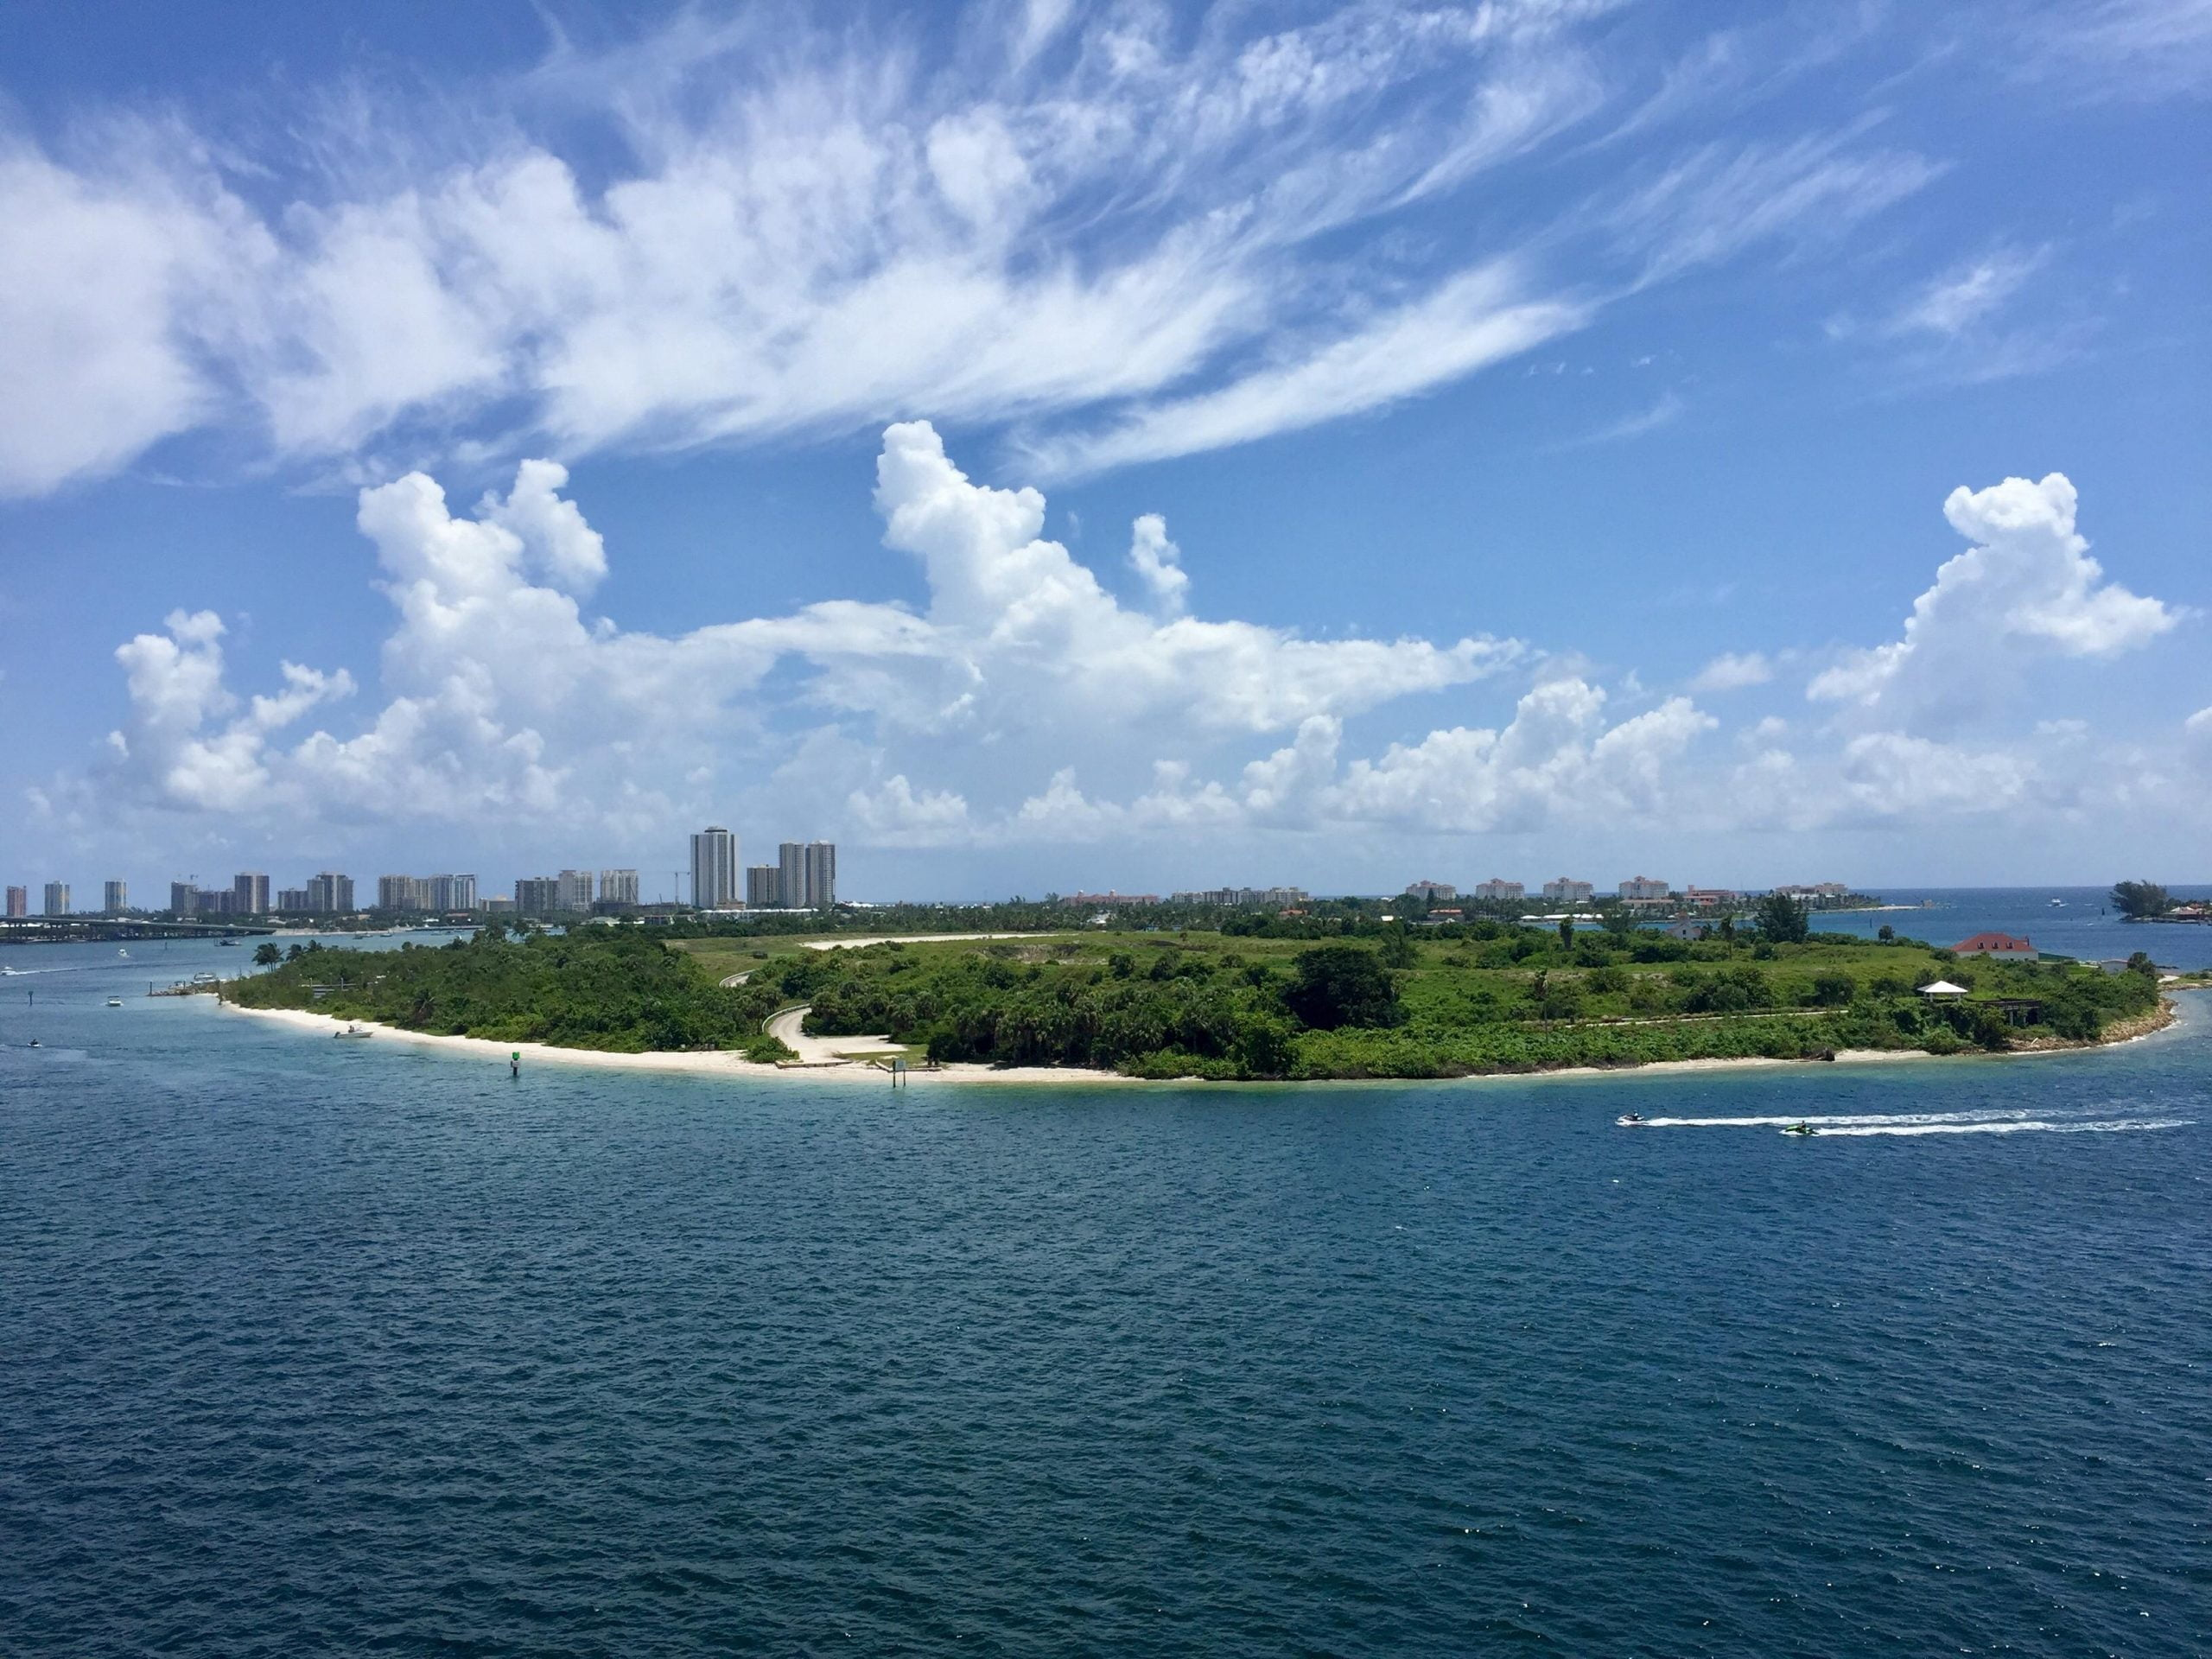 Peanut Island aerial view